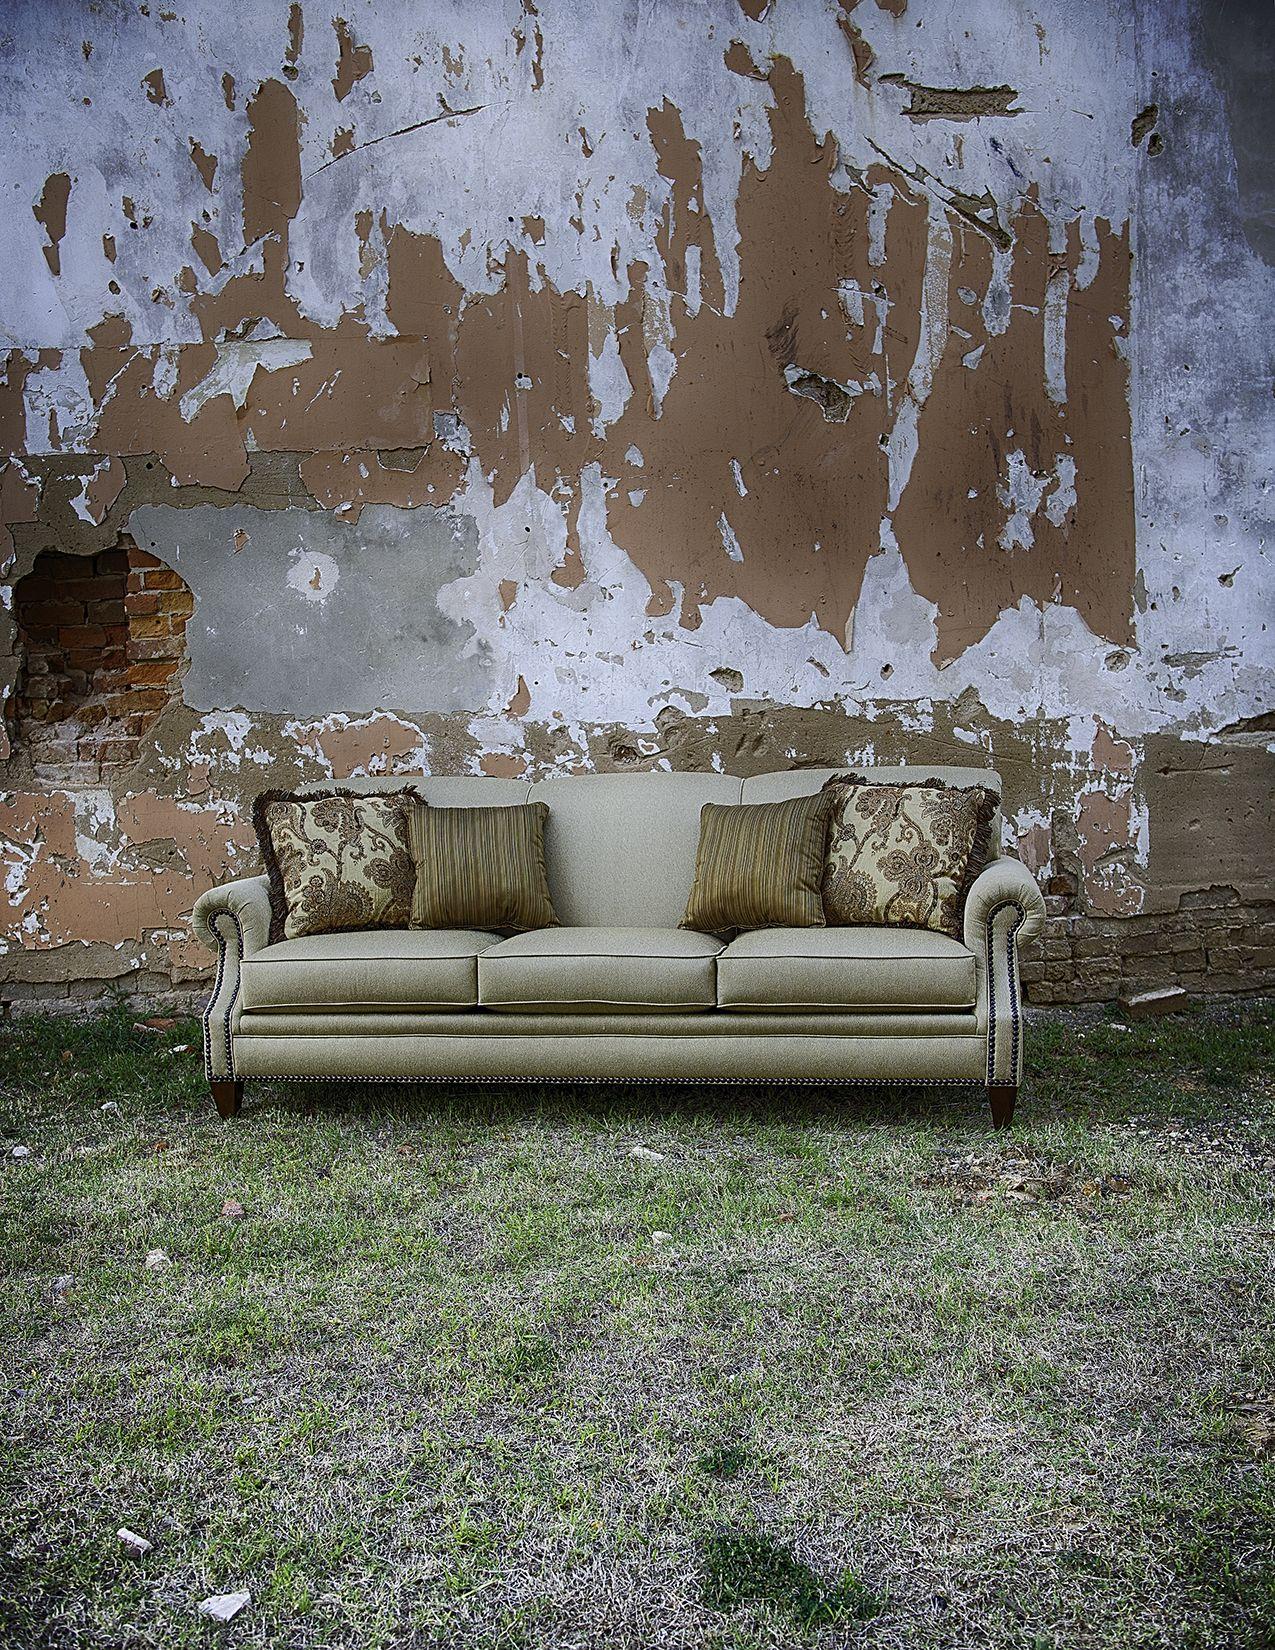 Mayo Furniture 3500 Fabric Sofa   Milan Honey   Find Your Mayo Furniture At Carteru0027s  Furniture In Midland, Texas 432 682 2843